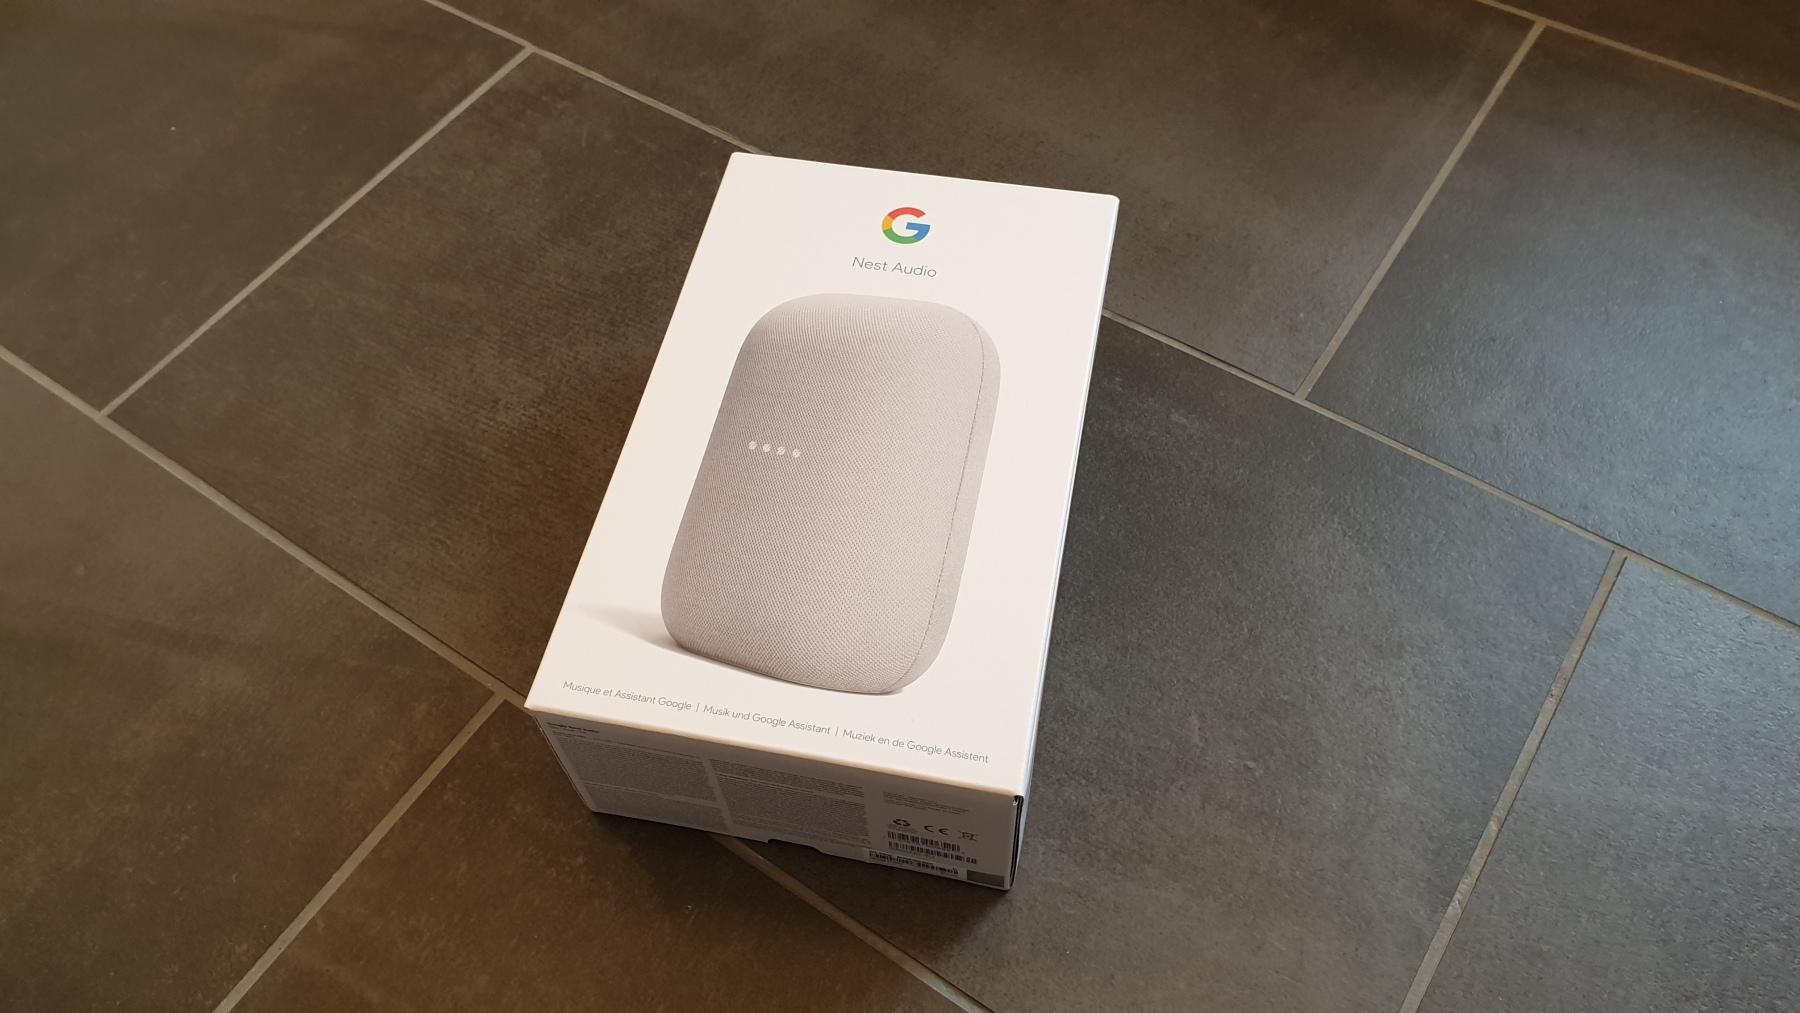 Google Nest Audio - Verpackung